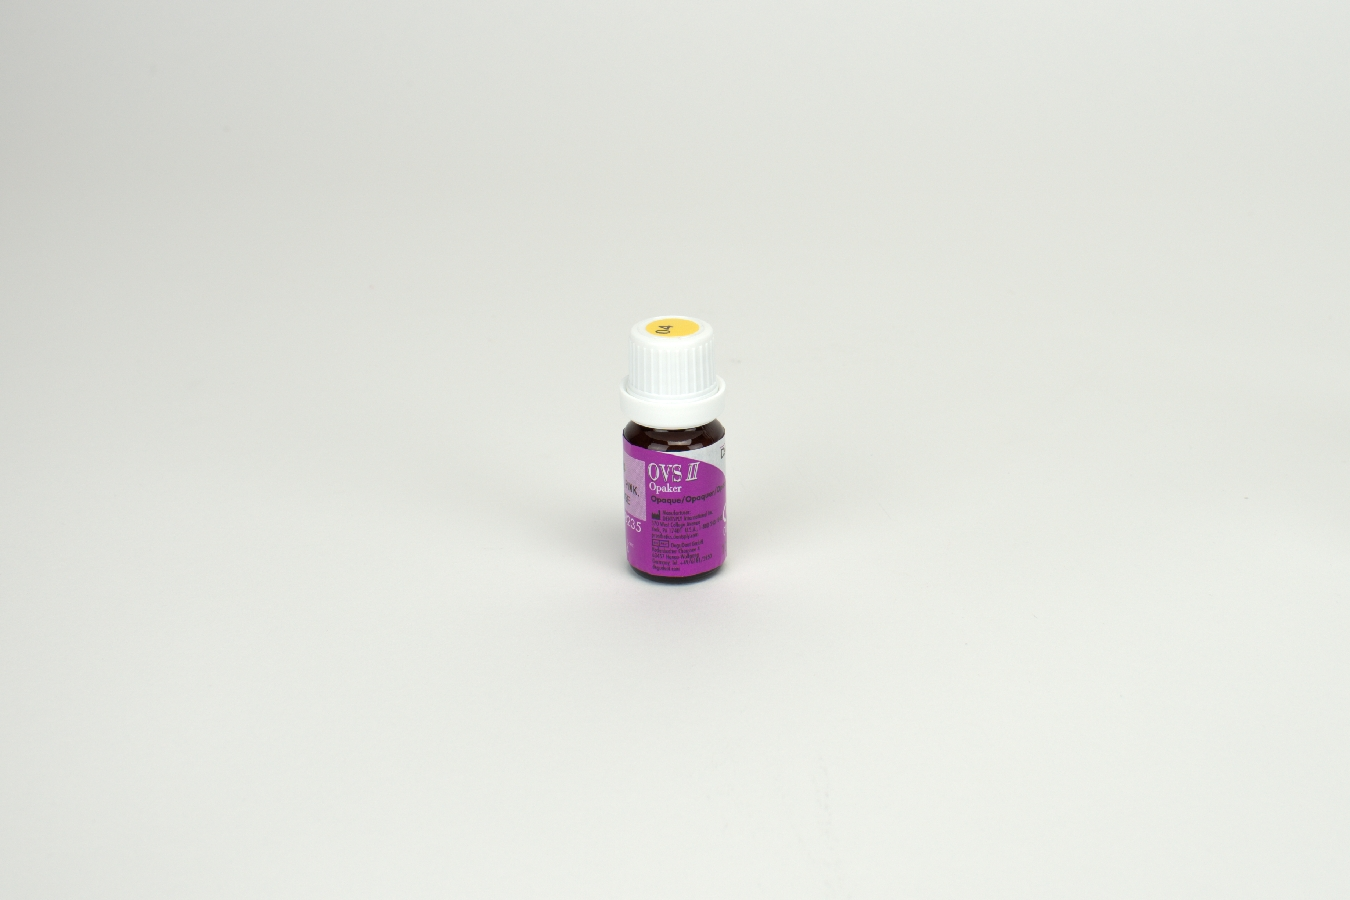 OVS-II-Opaker O4 pink 10ml Fl ;